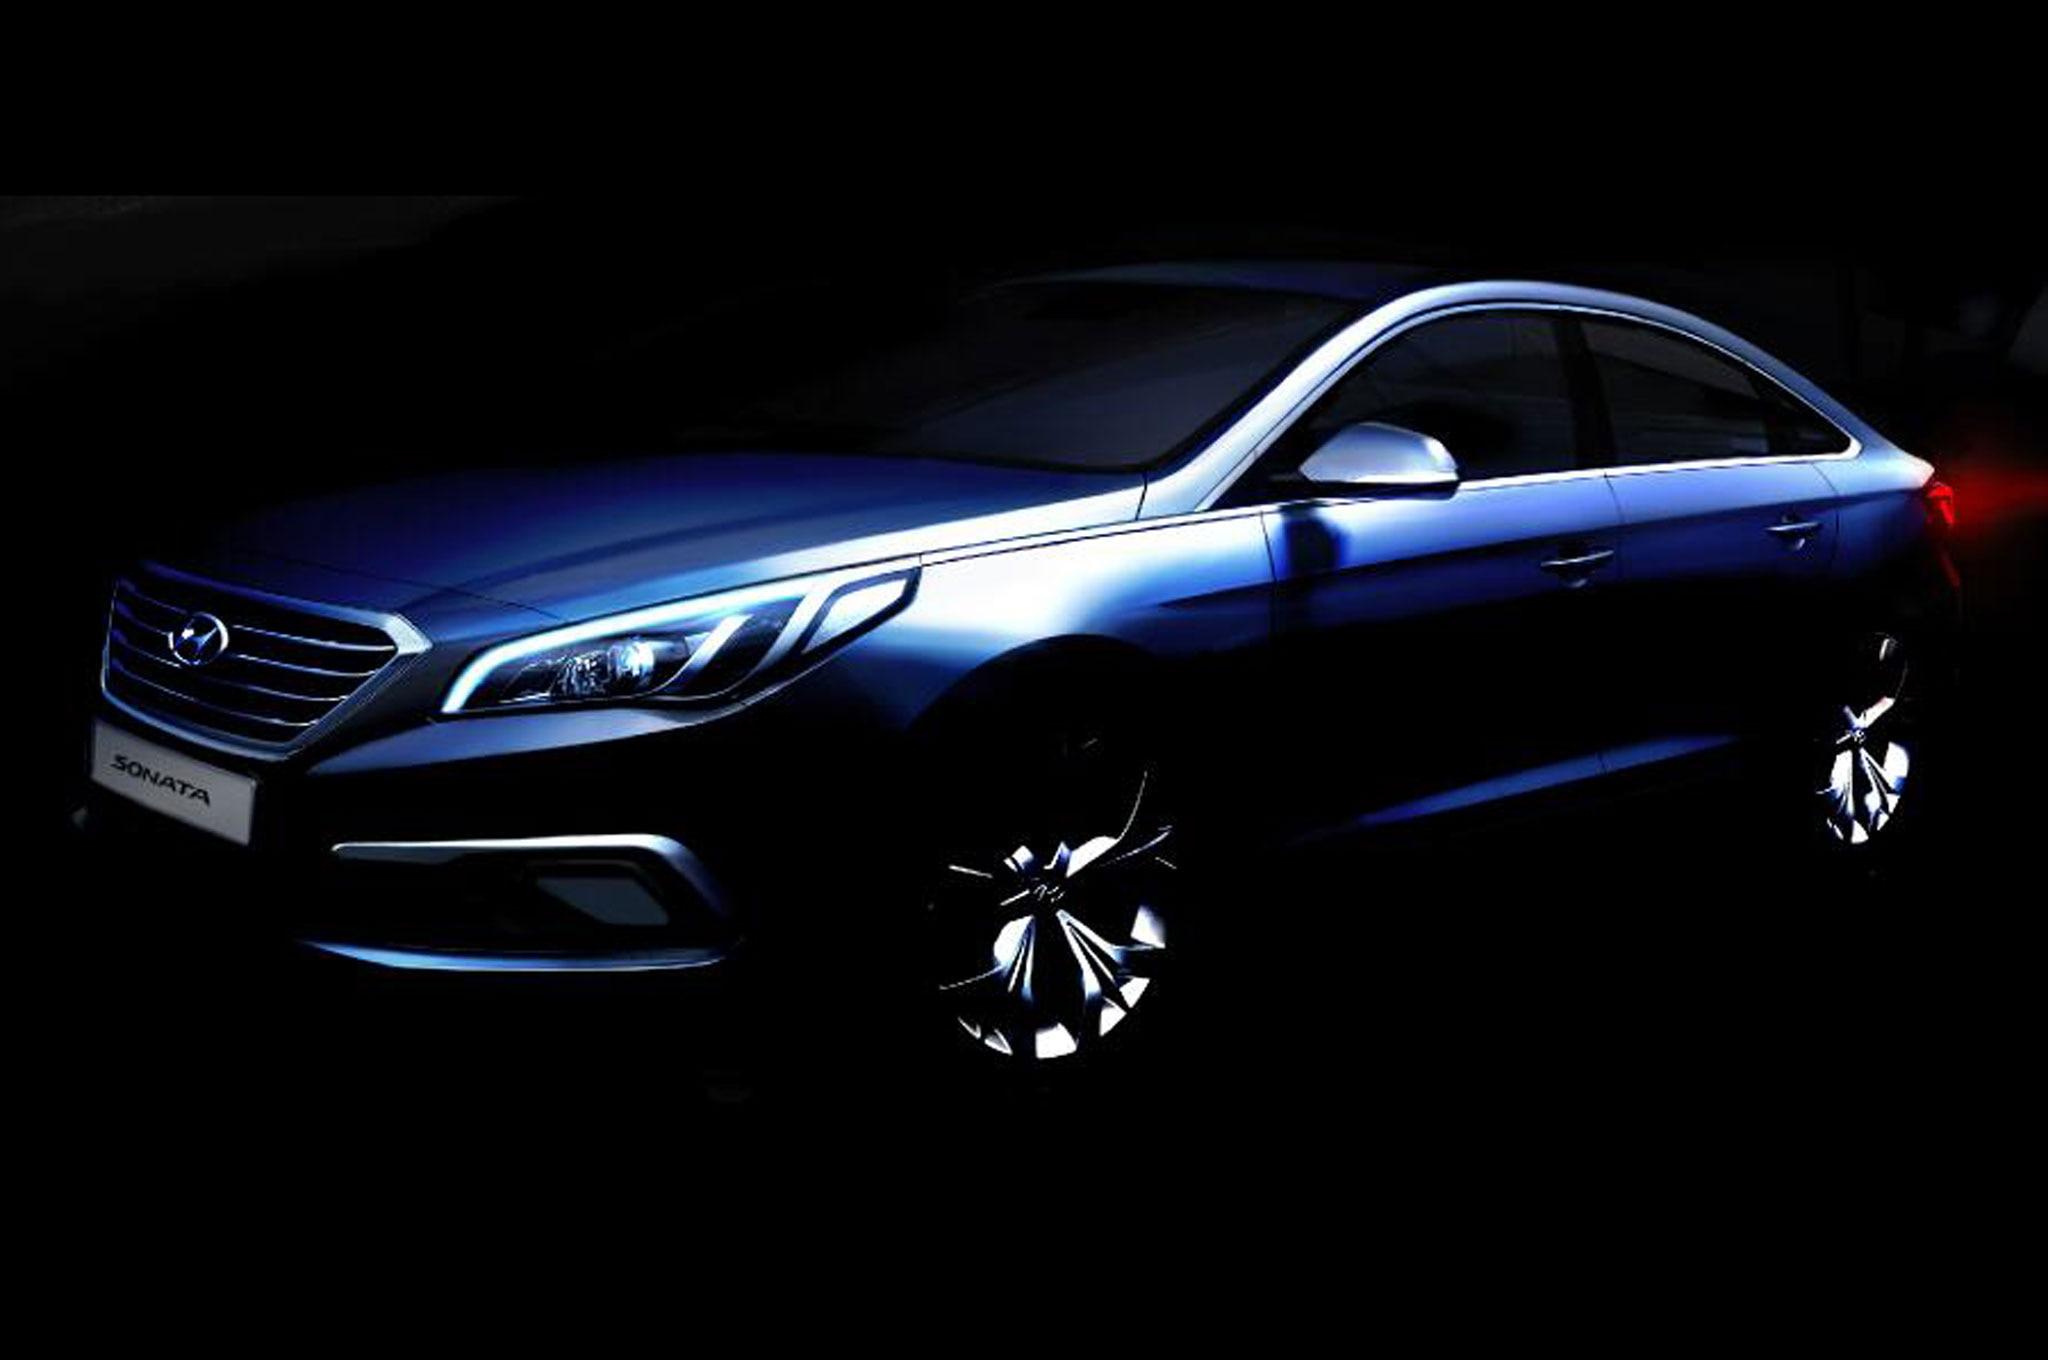 2015 Hyundai Sonata Rendering Front Three Quarters